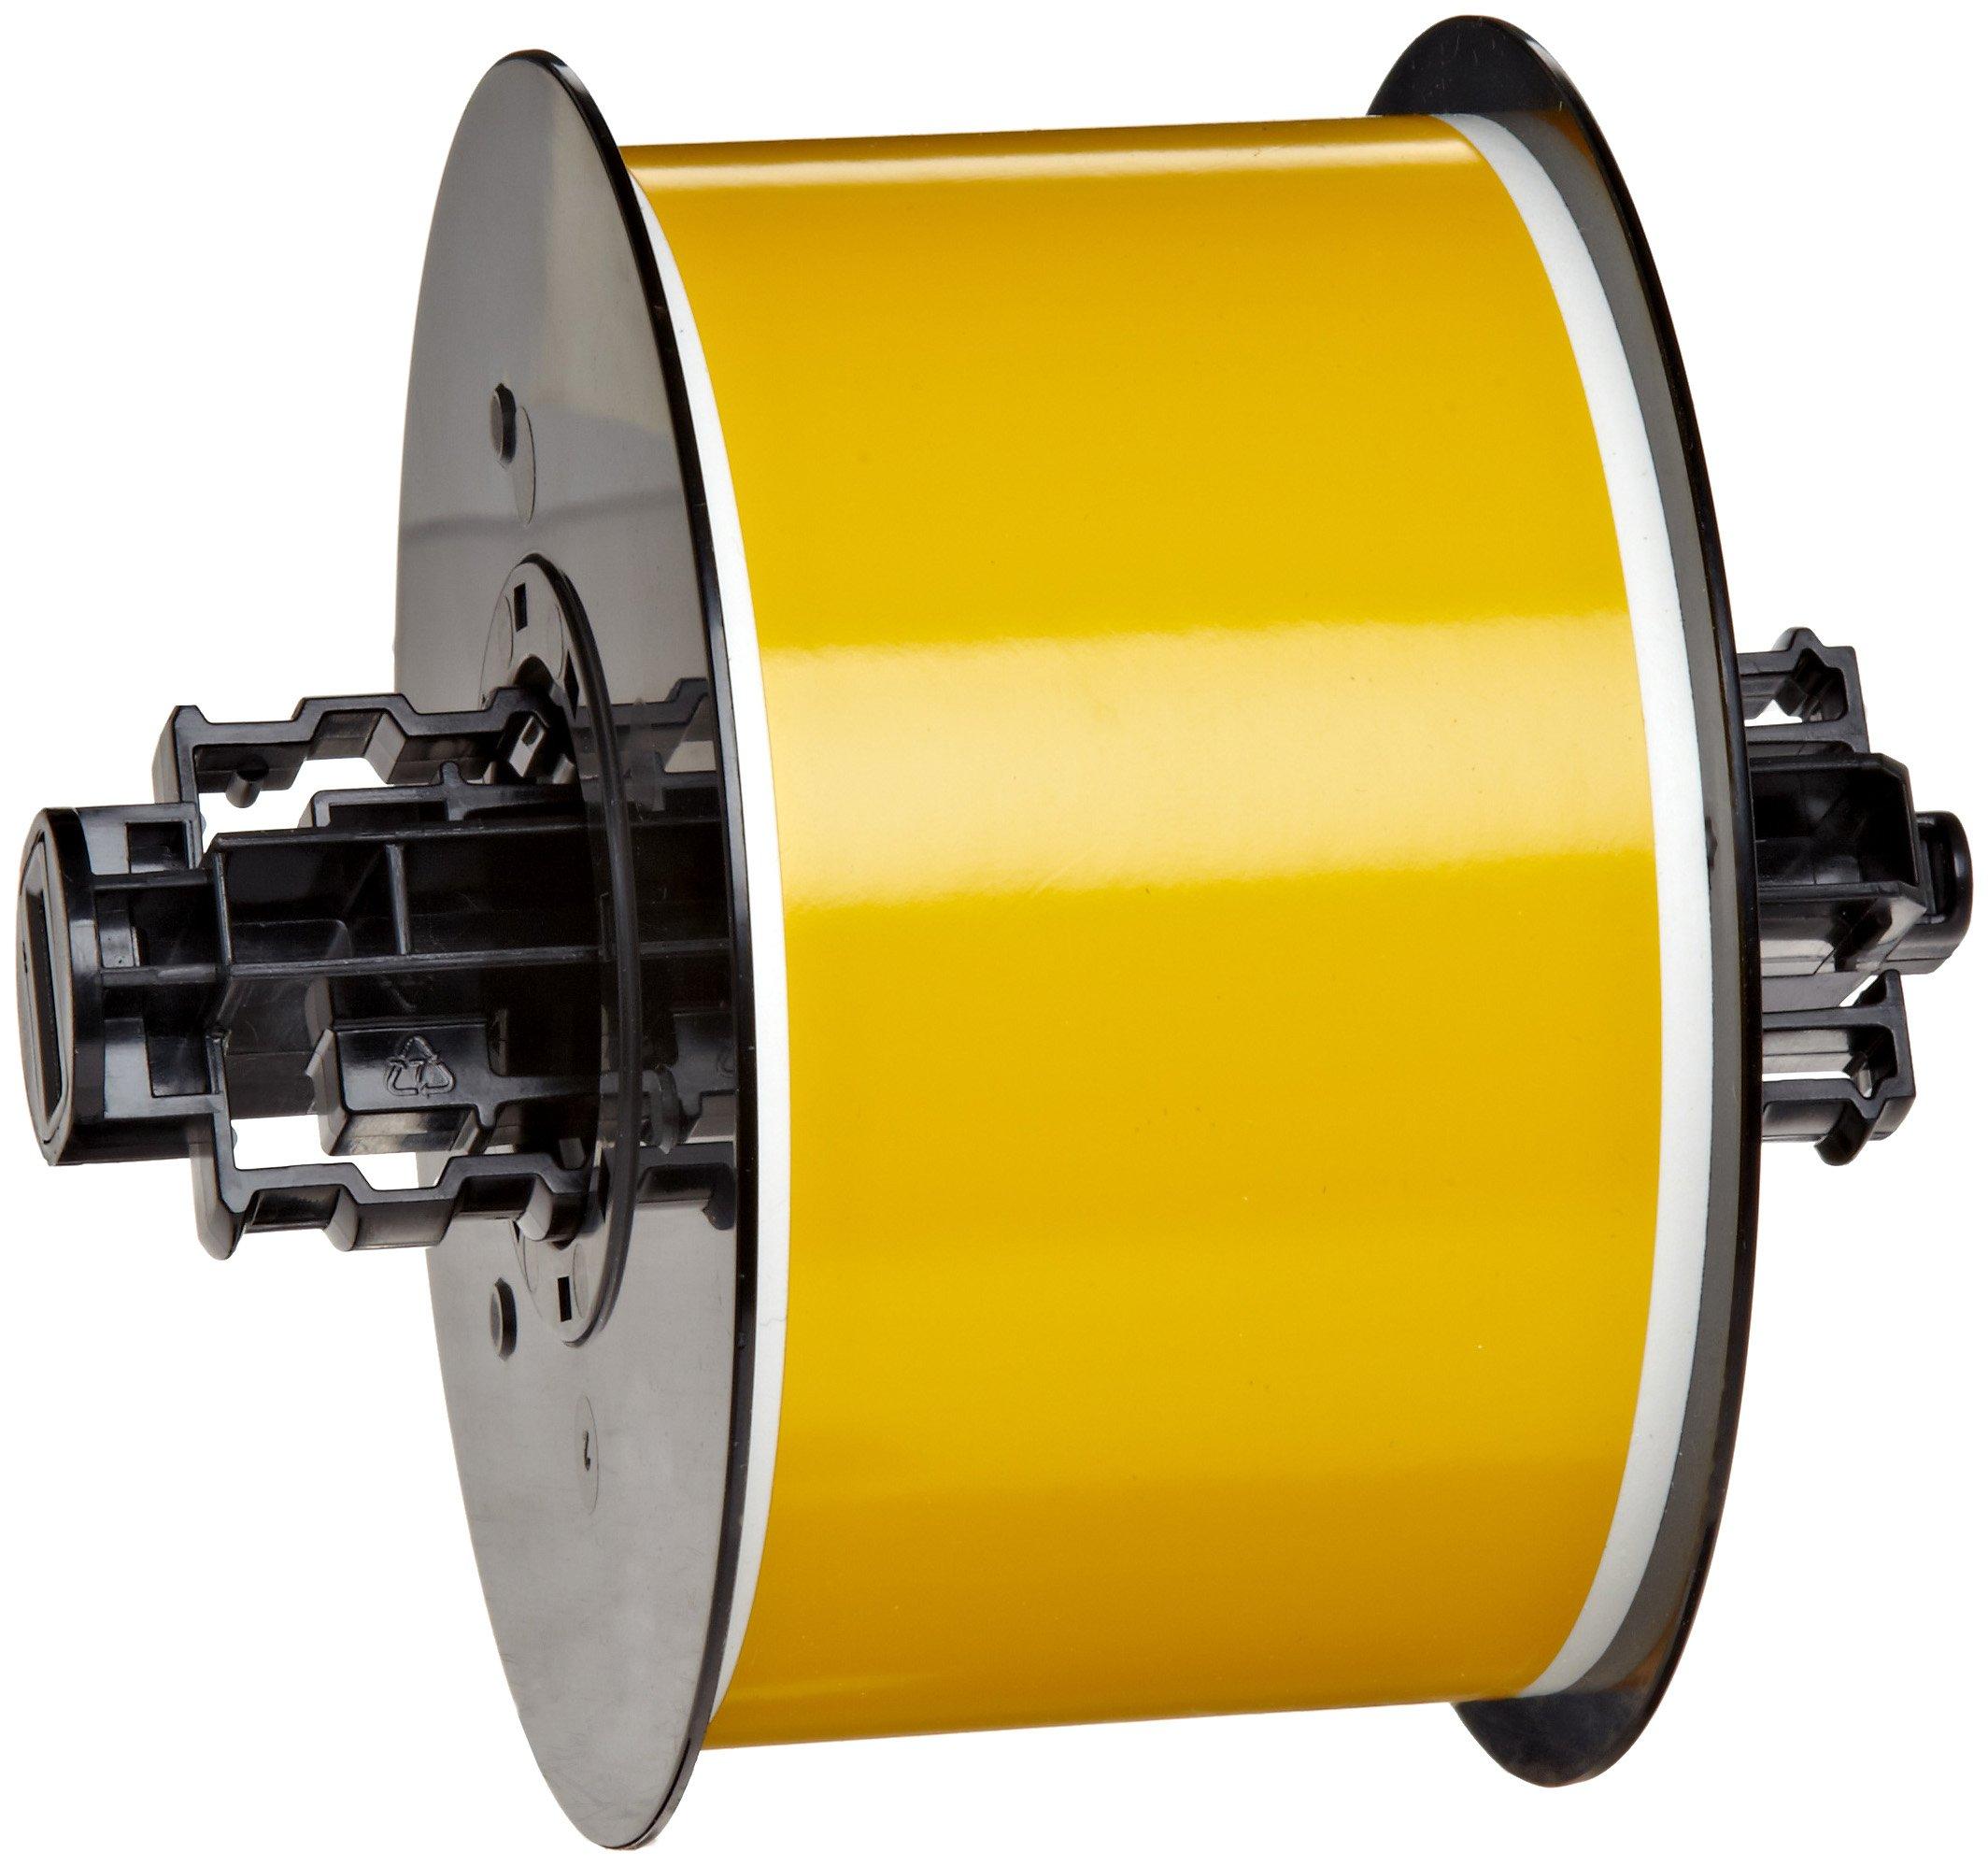 Brady B30C-2250-595-YL 100' Length x 2.250'' Width, B-595 Vinyl, Yellow BBP31 Indoor/Outdoor Tape by Brady